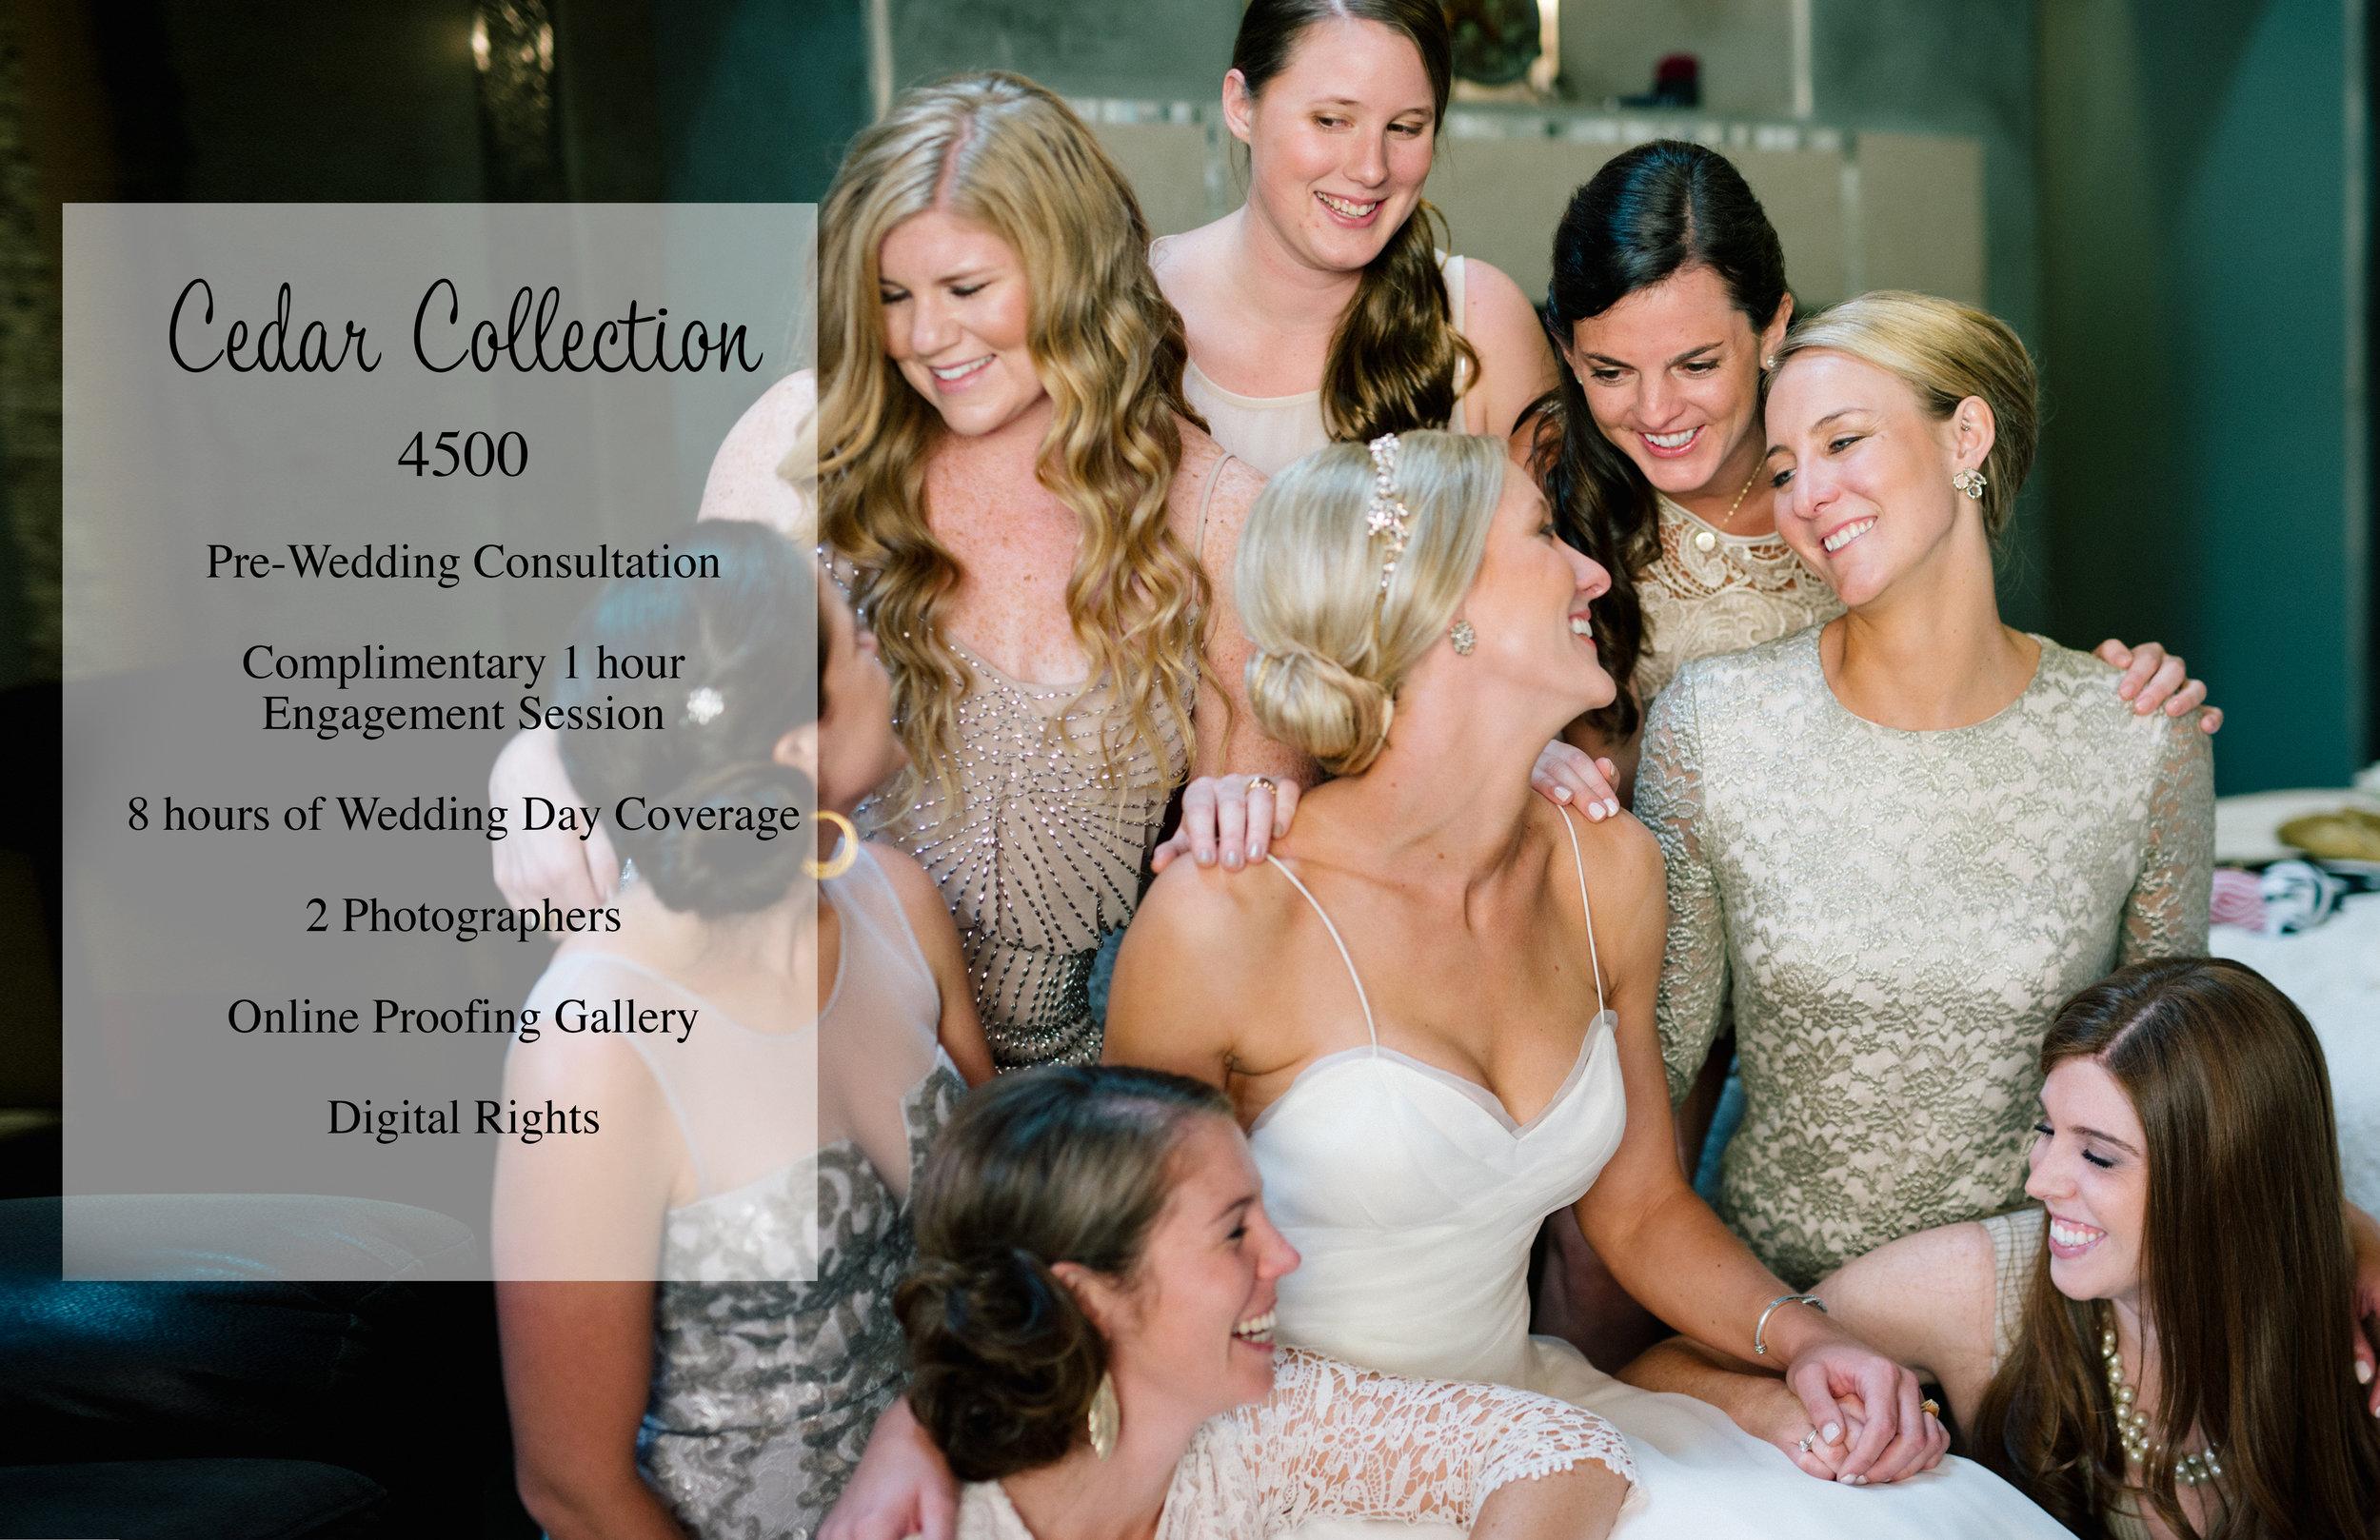 Wedding Cedar Collection3.jpg